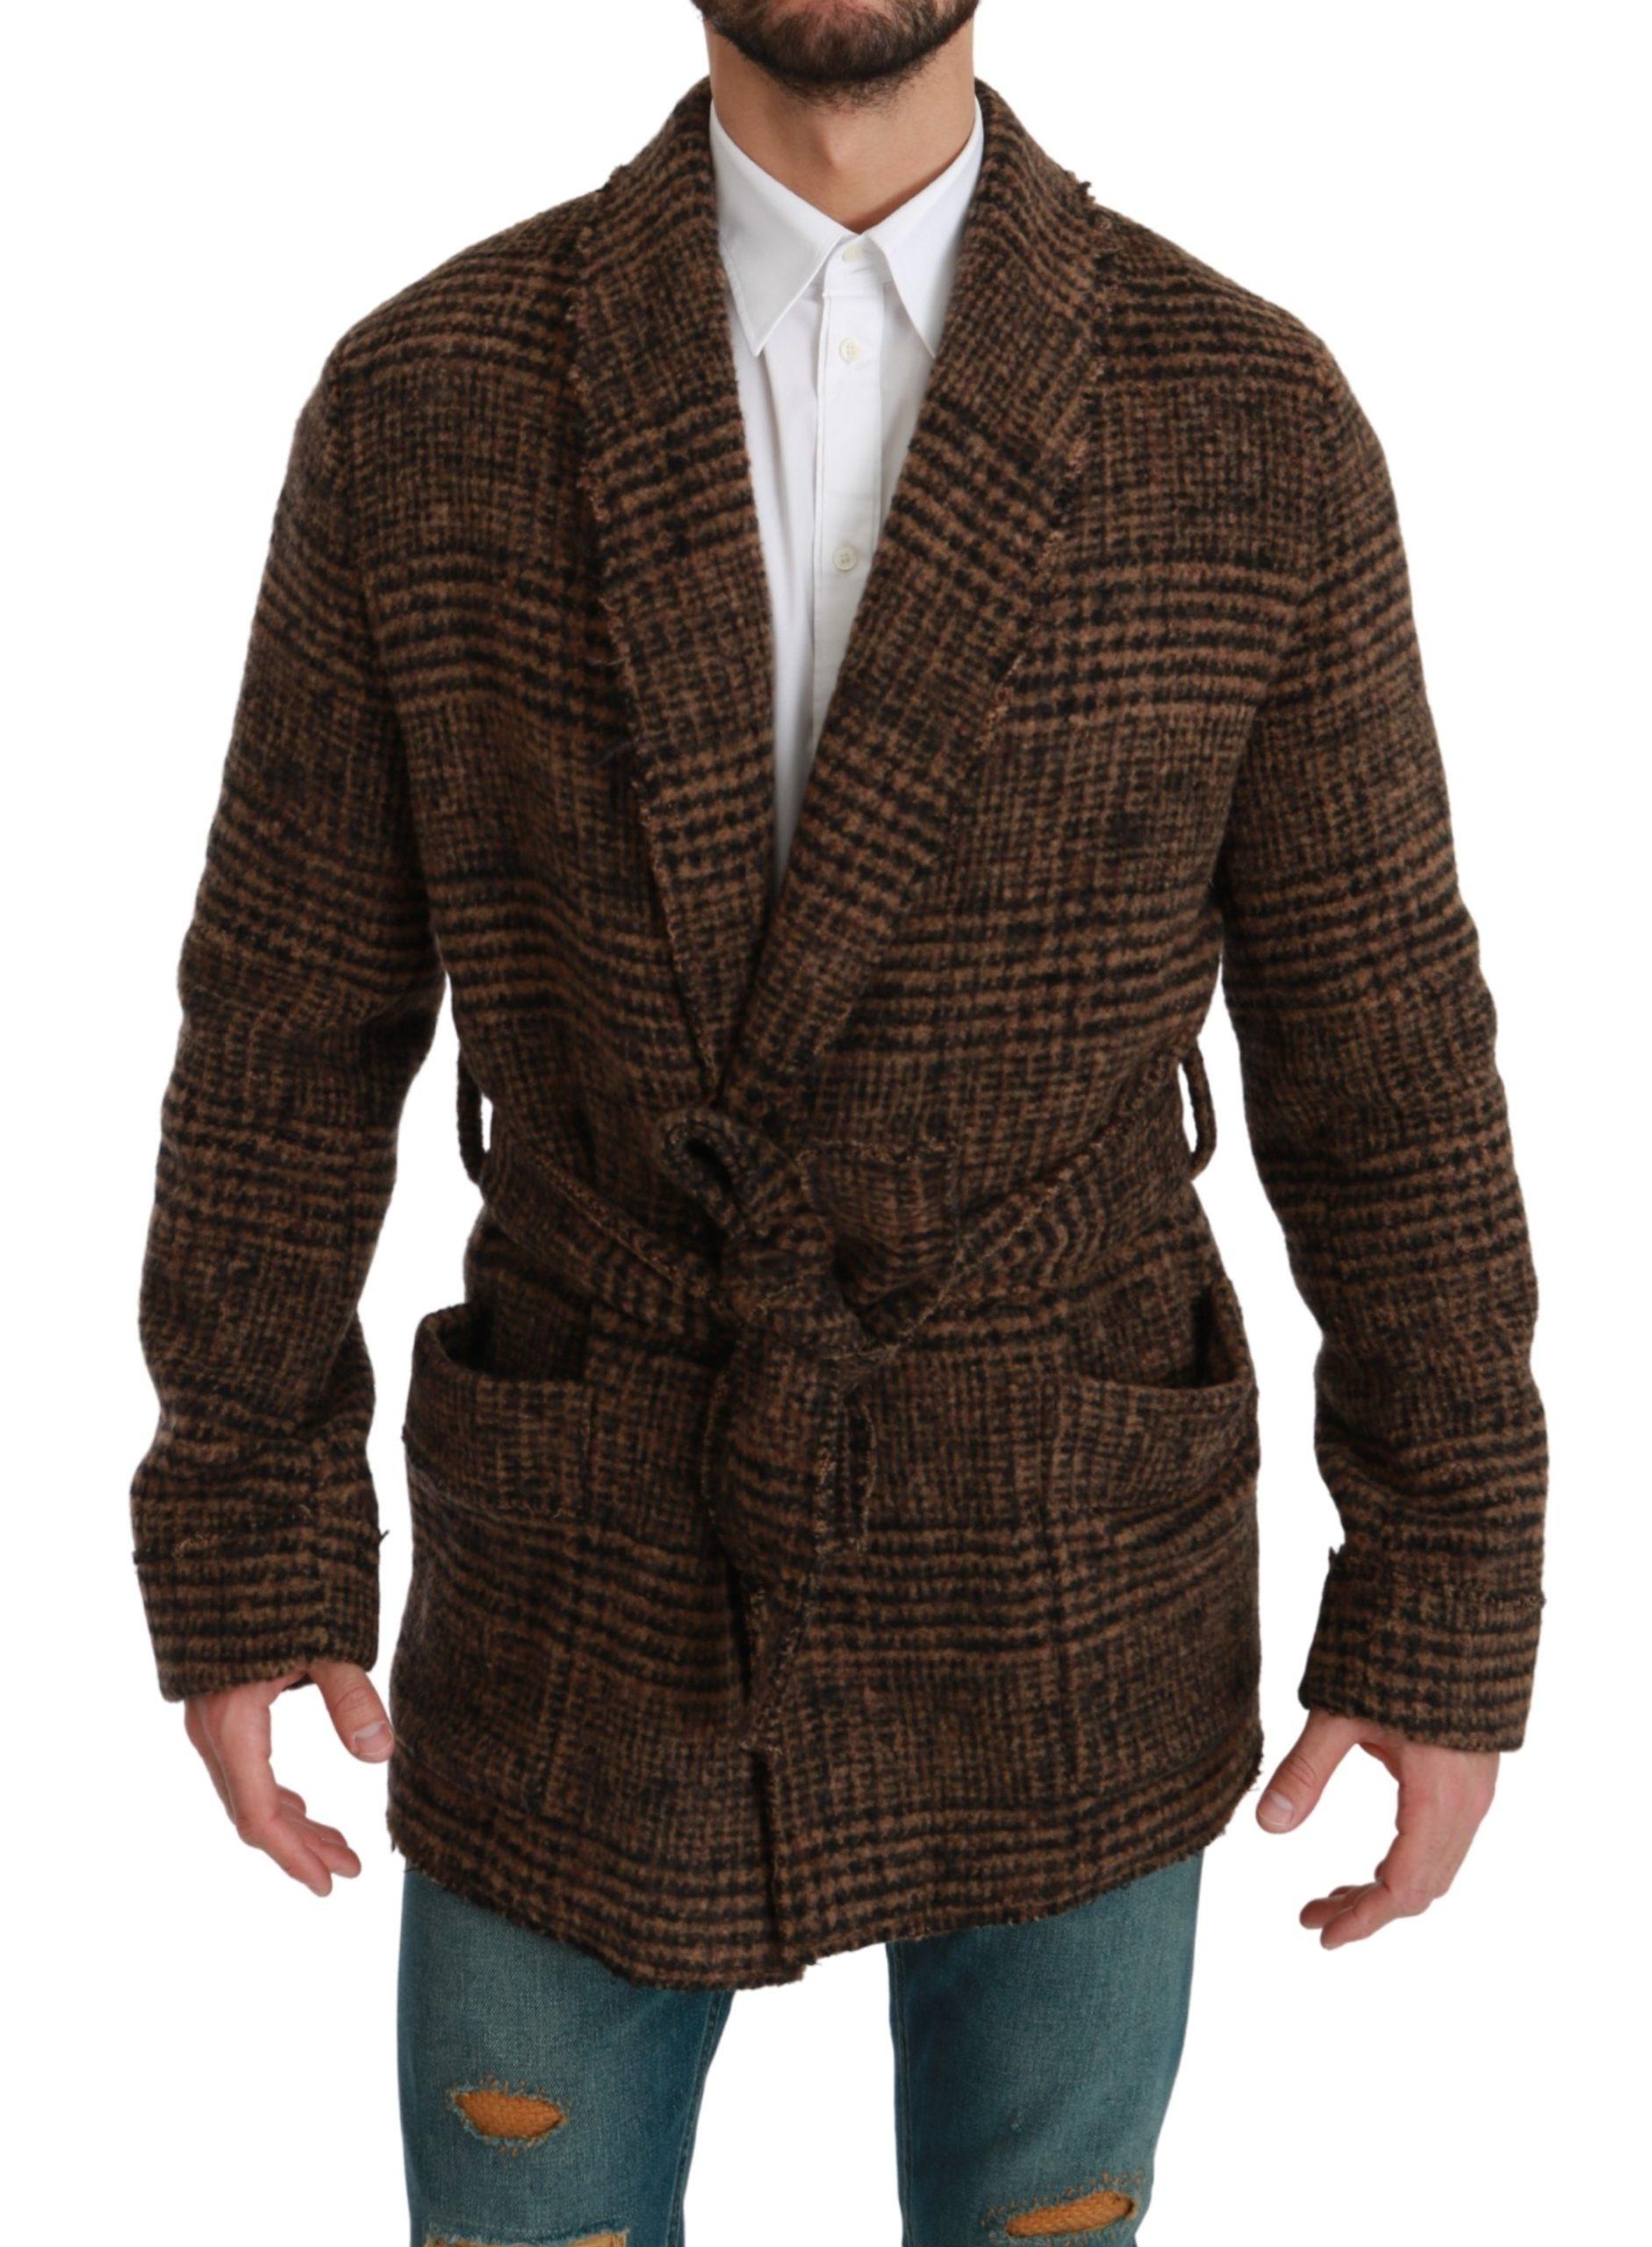 Dolce & Gabbana Men's Checkered Wool Robe Wrap Coat Red JKT2623 - IT44 | XS